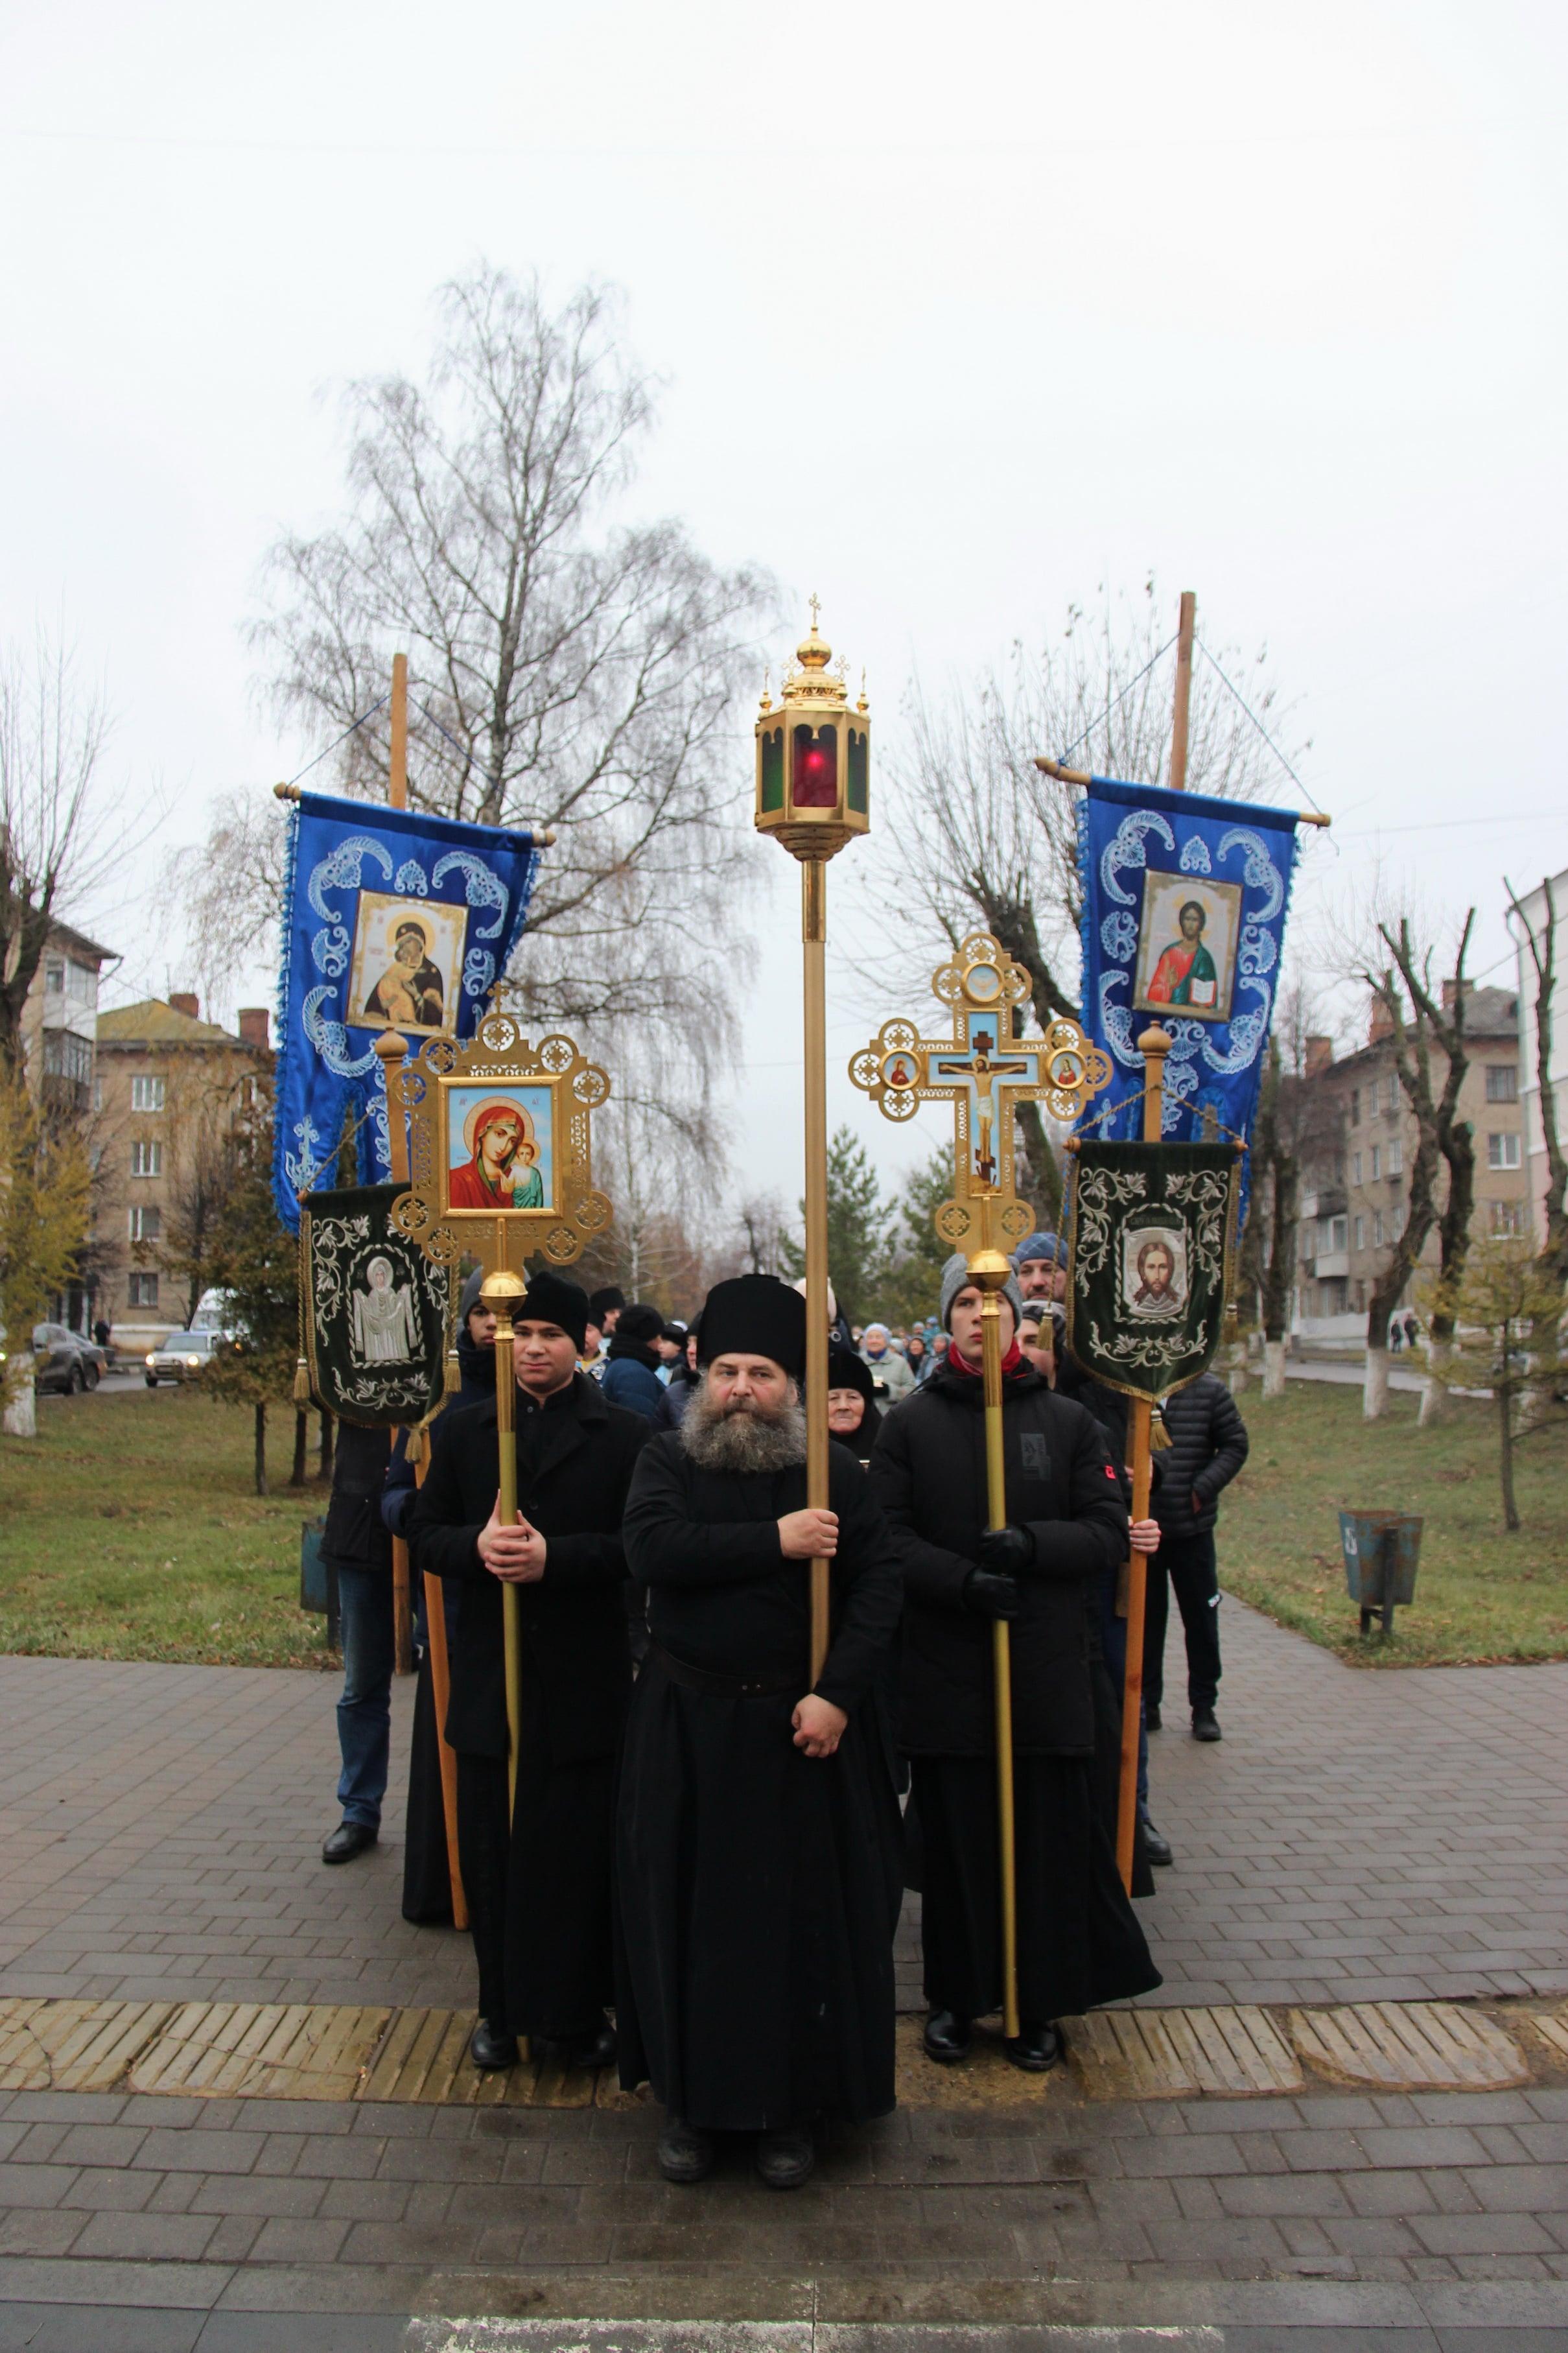 http://monuspen.ru/photoreports/e885ad143ffeae12541ceee7e7725b2d.JPG